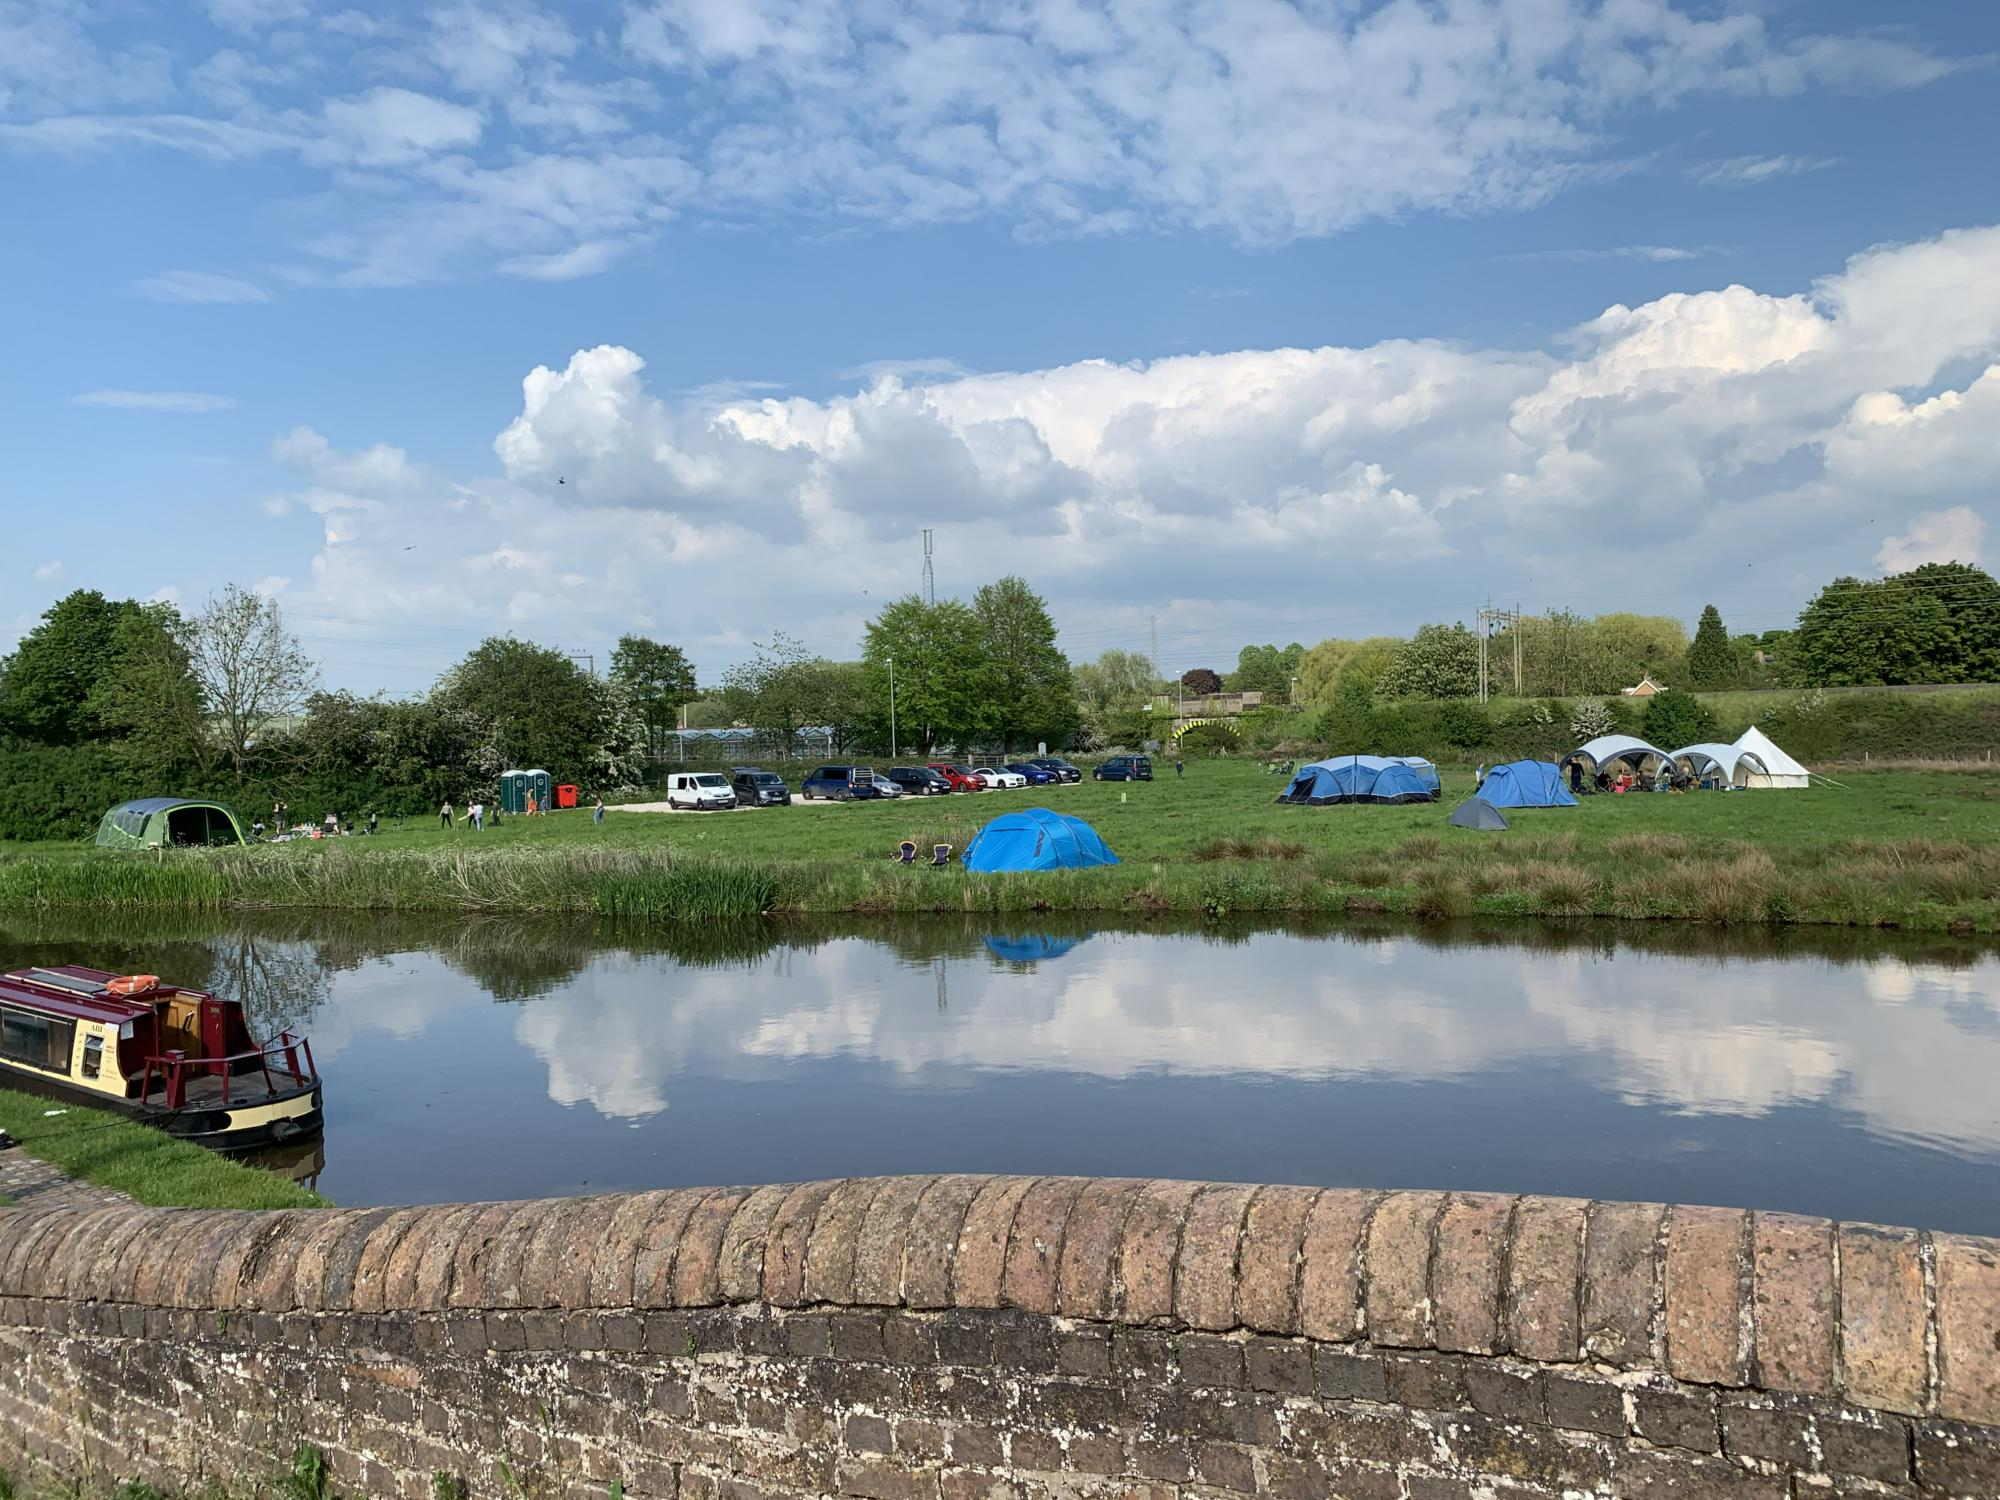 Campsites in Staffordshire – I Love This Campsite